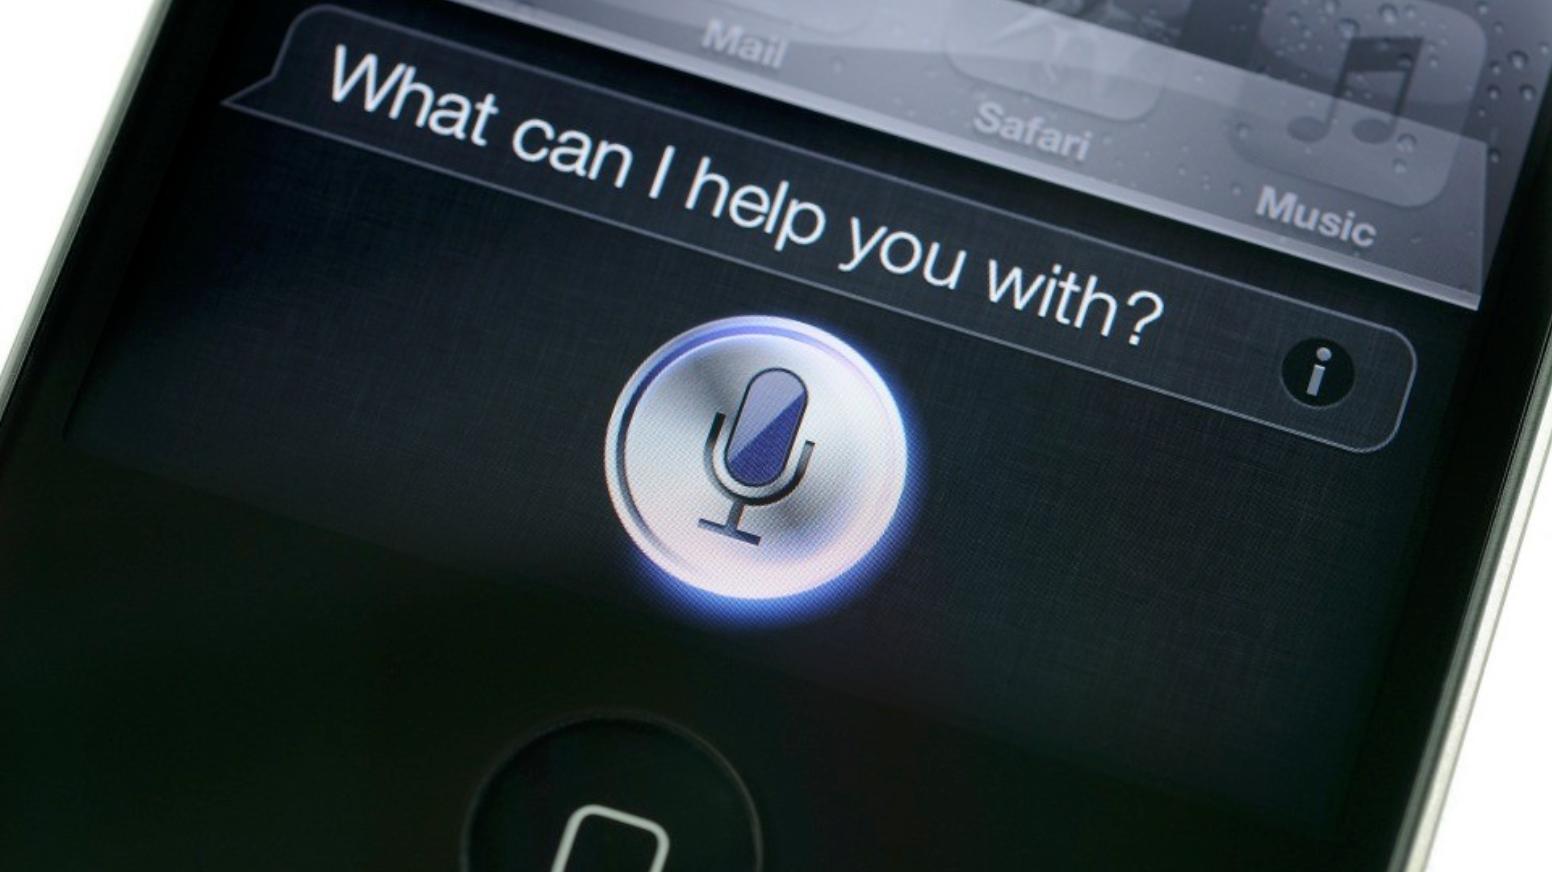 первая версия siri для iphone